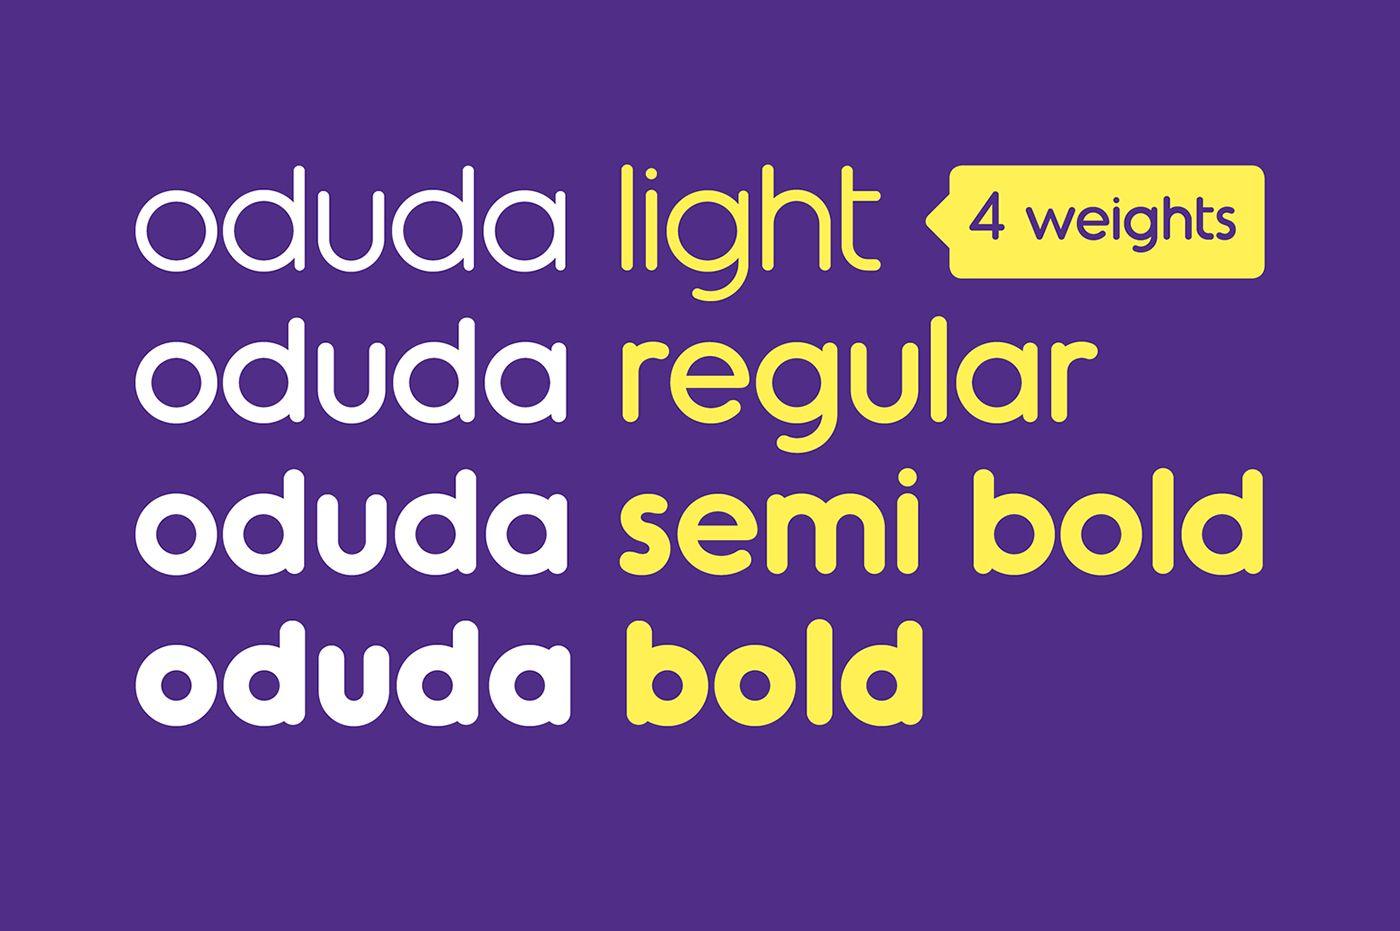 Oduda - Rounded Typeface on Behance